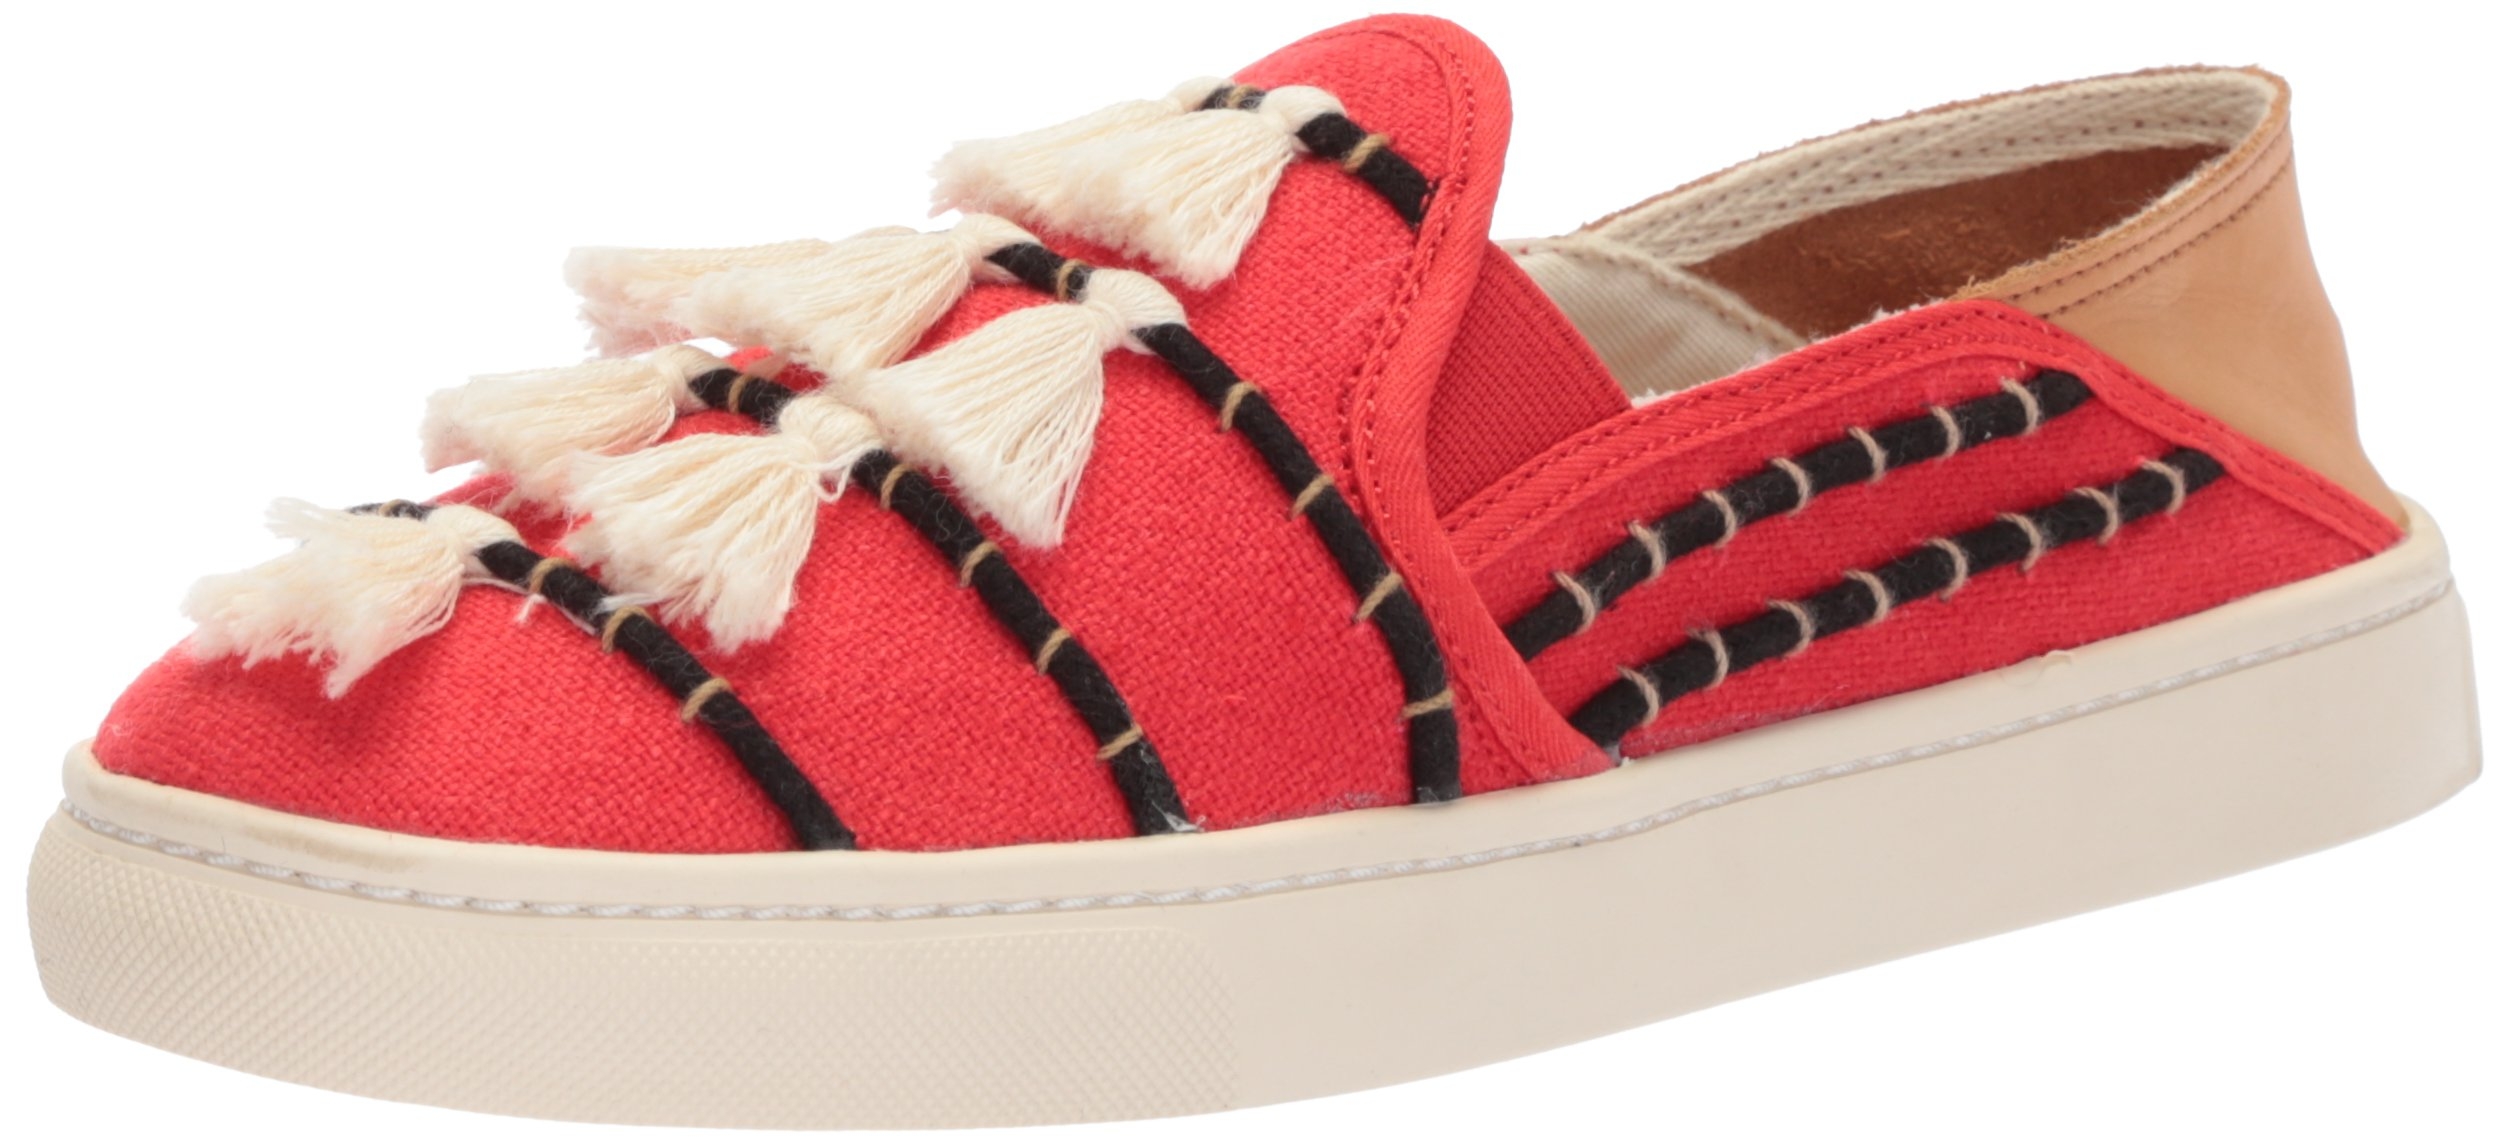 Soludos Women's Tassel Slip Sneaker, Red/Beige, 8 B US by Soludos (Image #1)